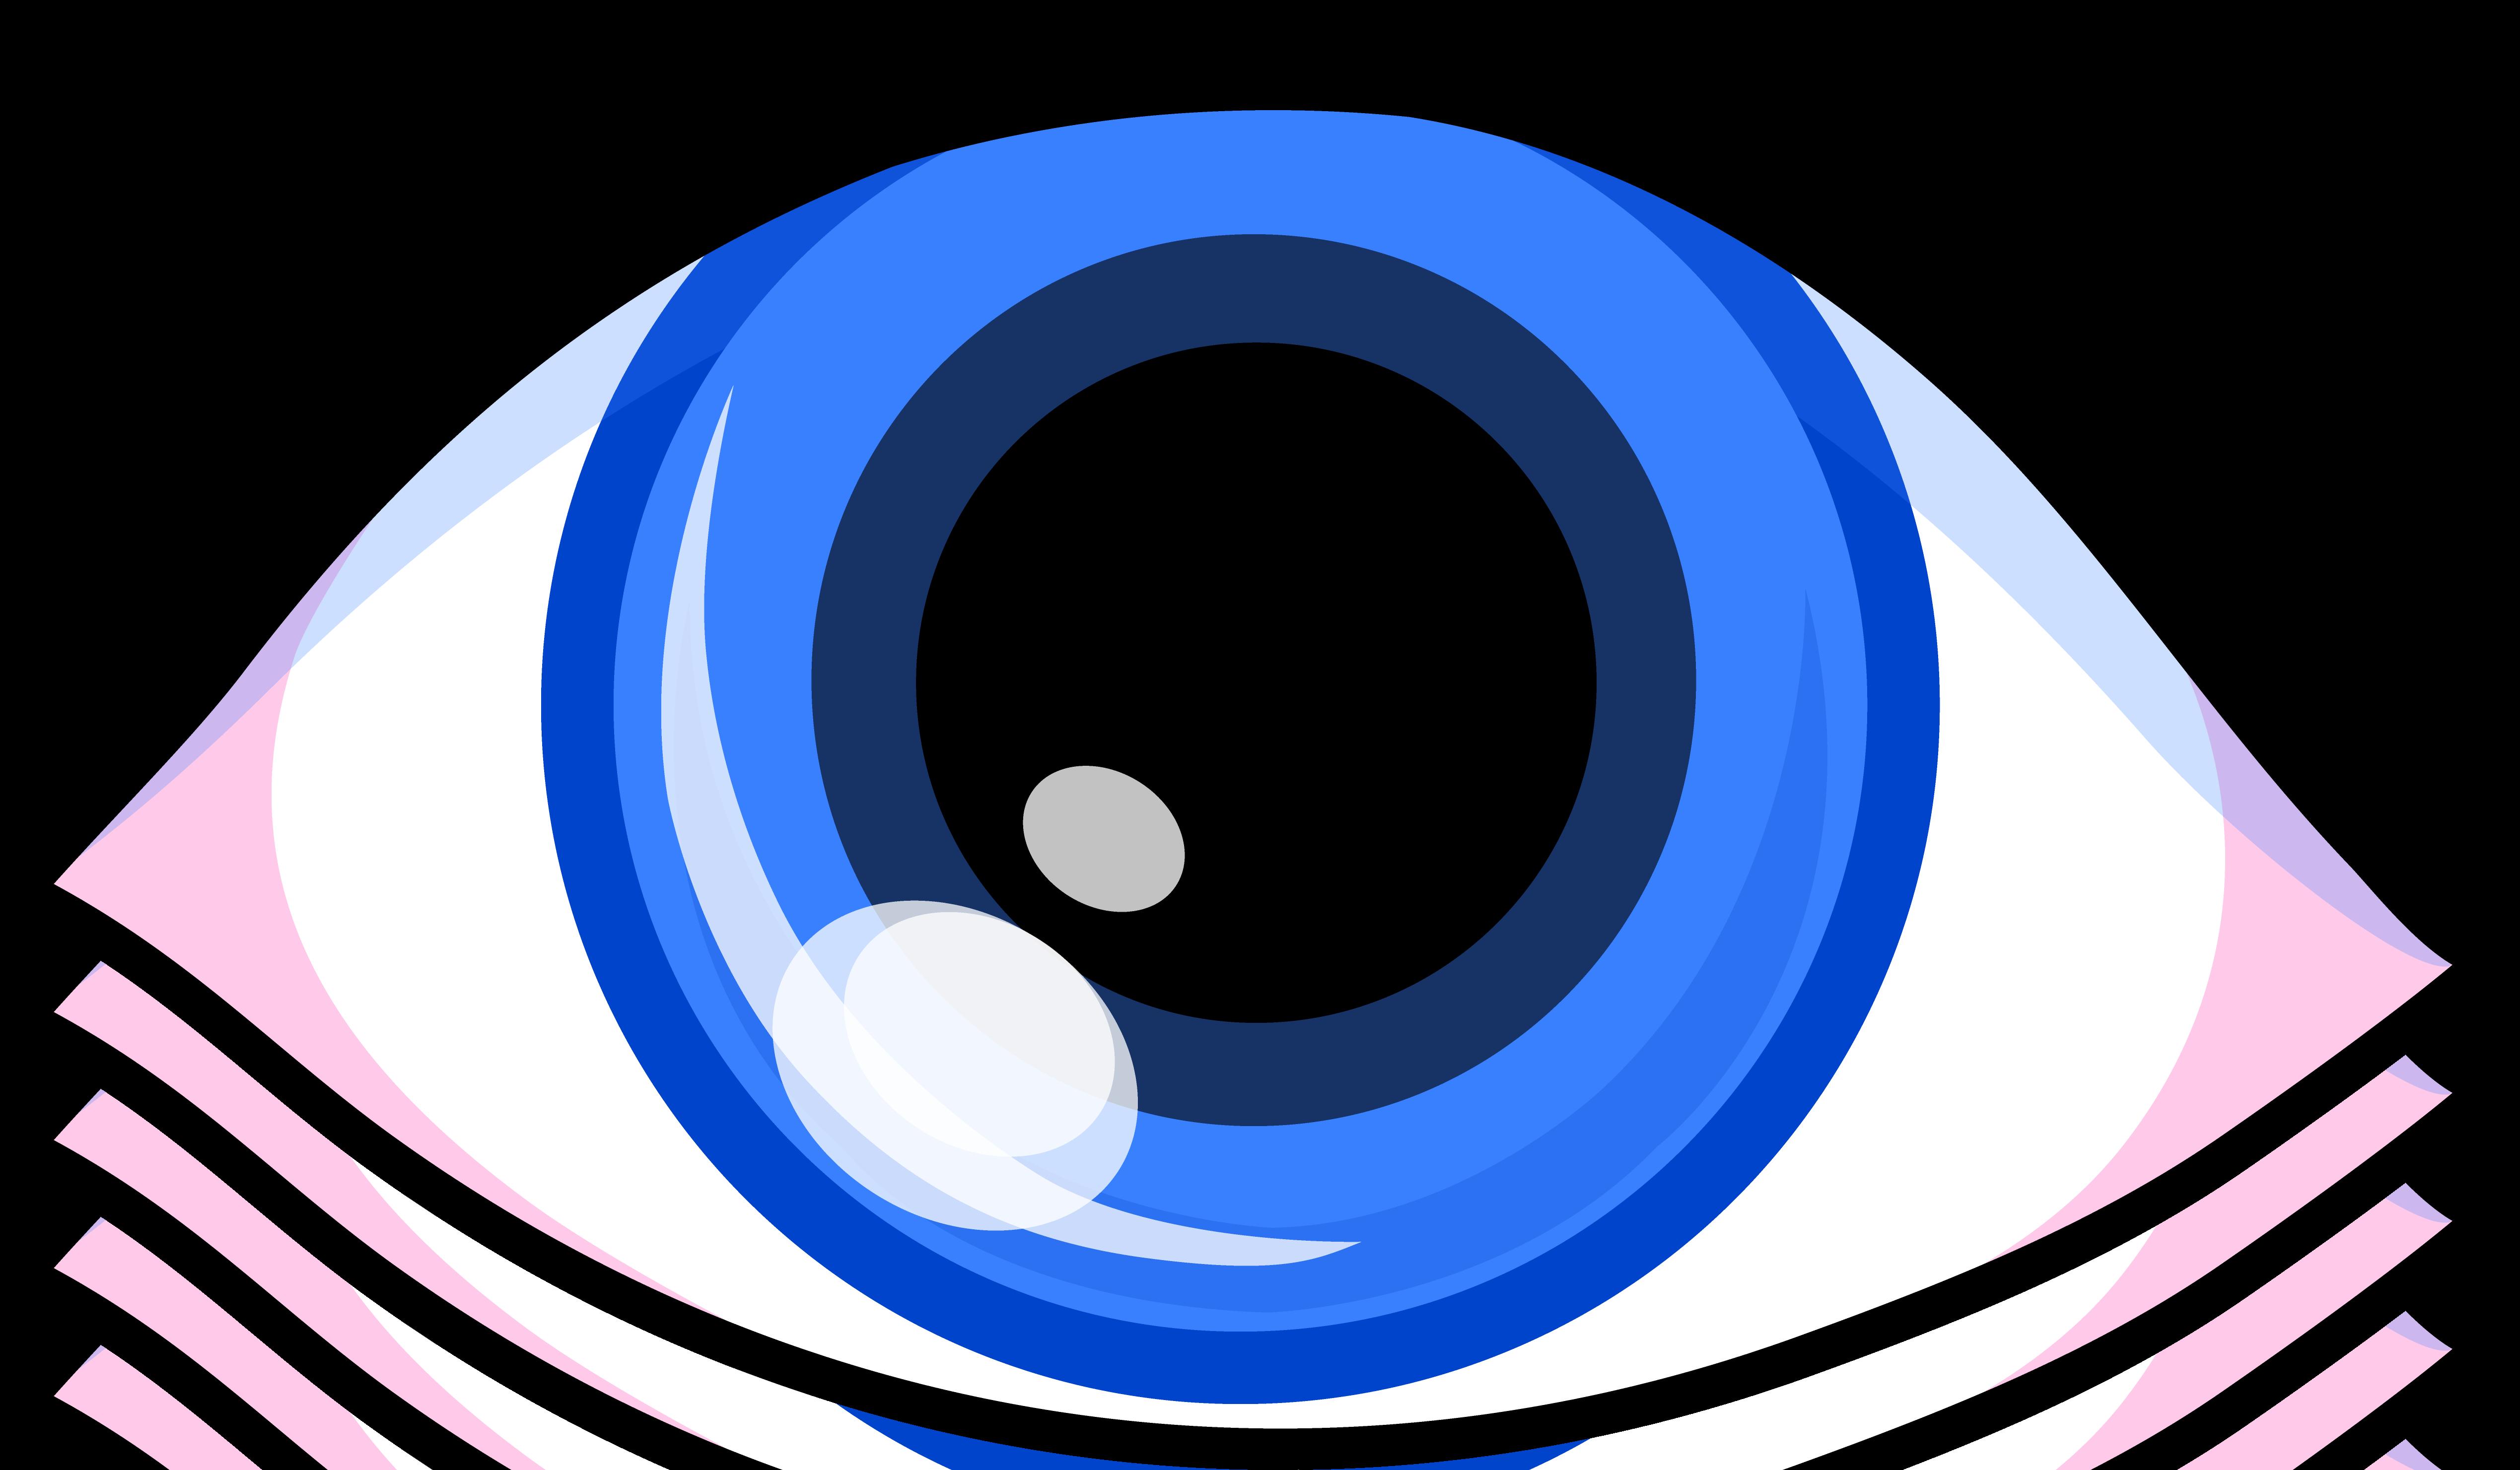 5076x2962 Blue Eye Drawing